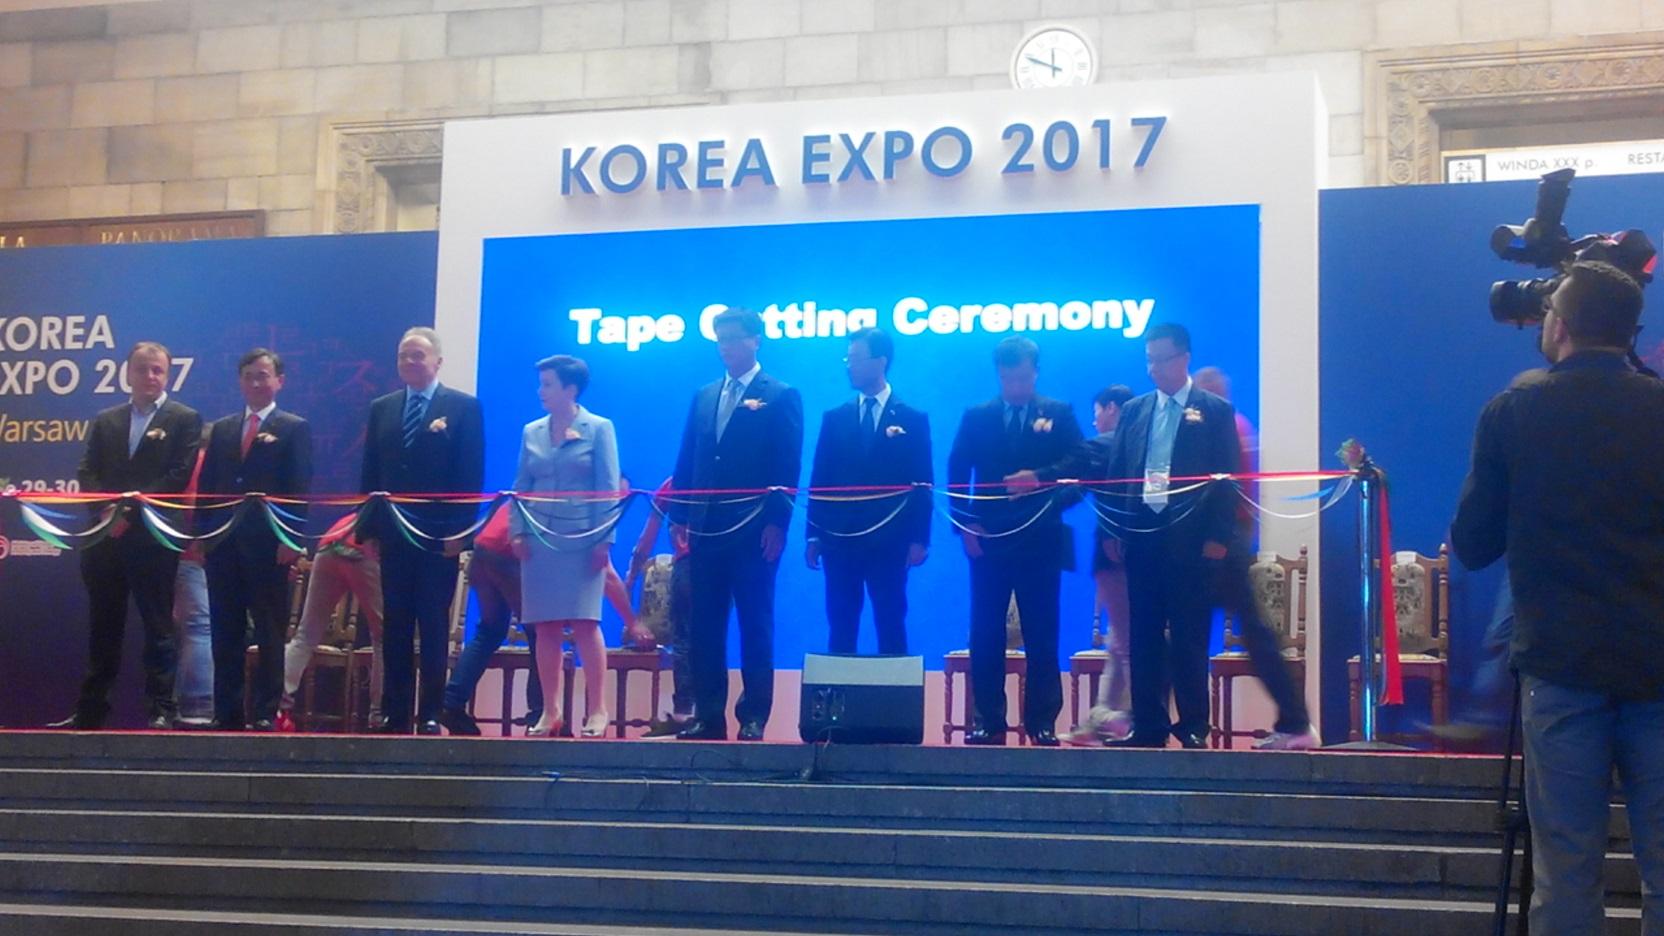 korea-expo-2017-otwarcie